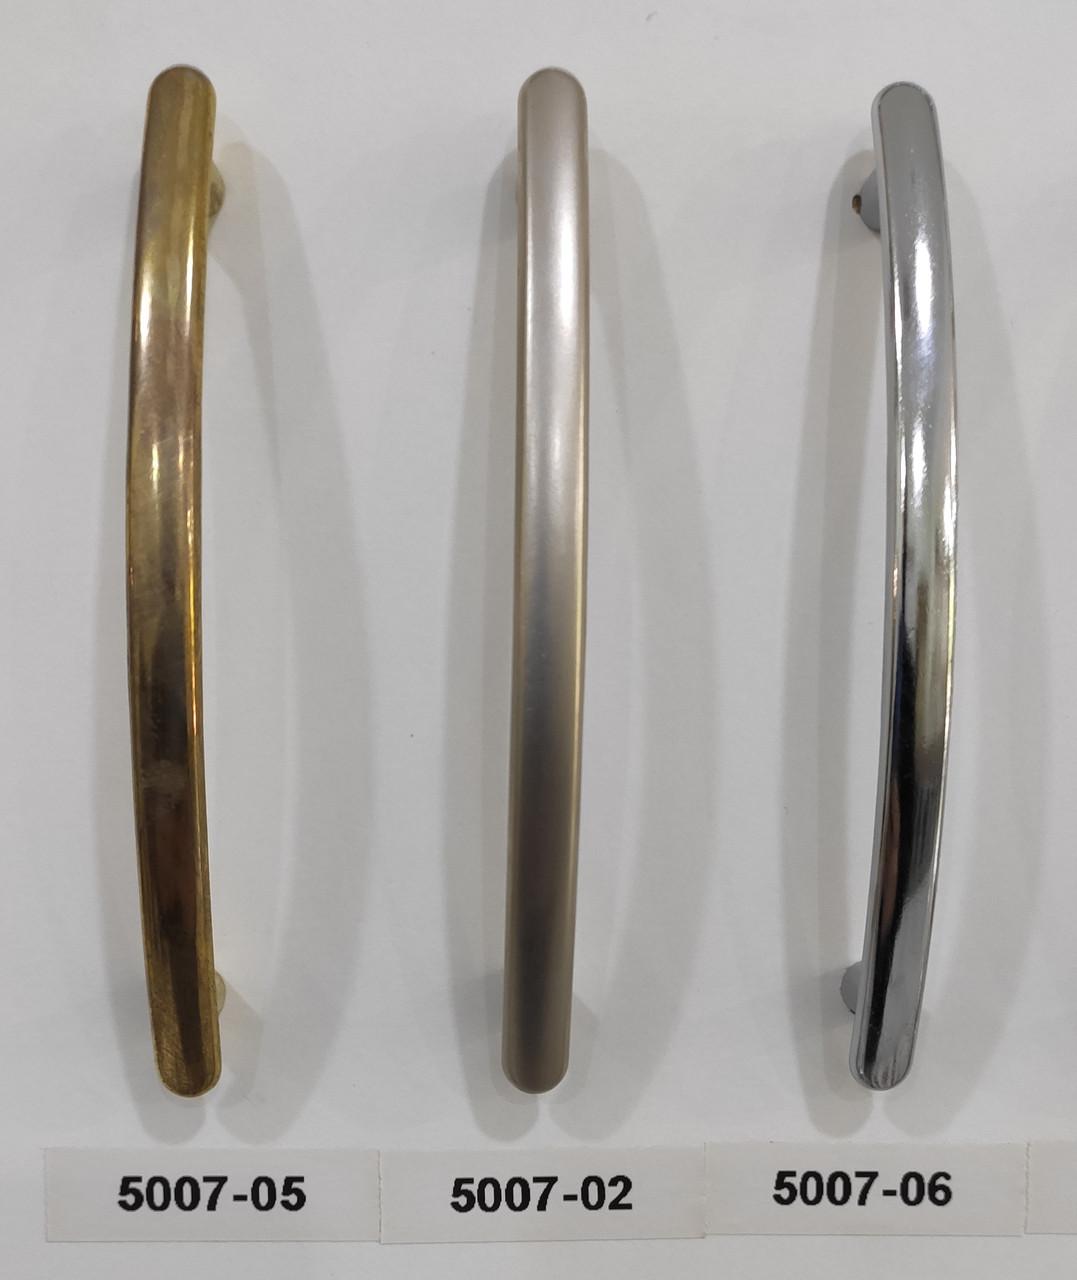 Ручка меблева Ozkardesler 5007-05 ELIF 96мм Жовтий